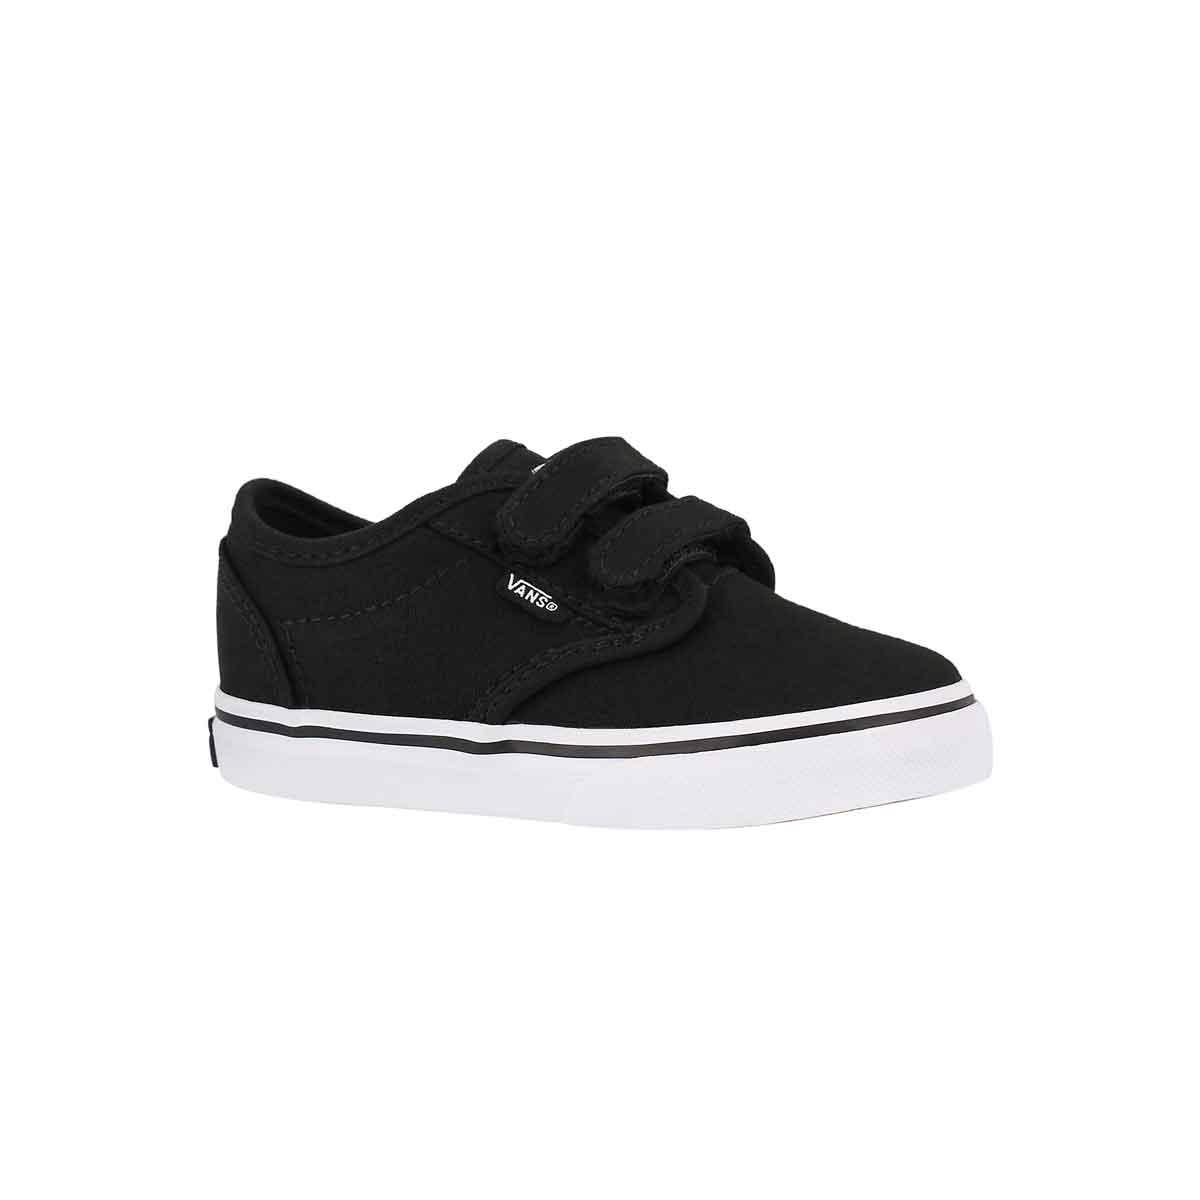 Infants' ATWOOD black/white sneaker